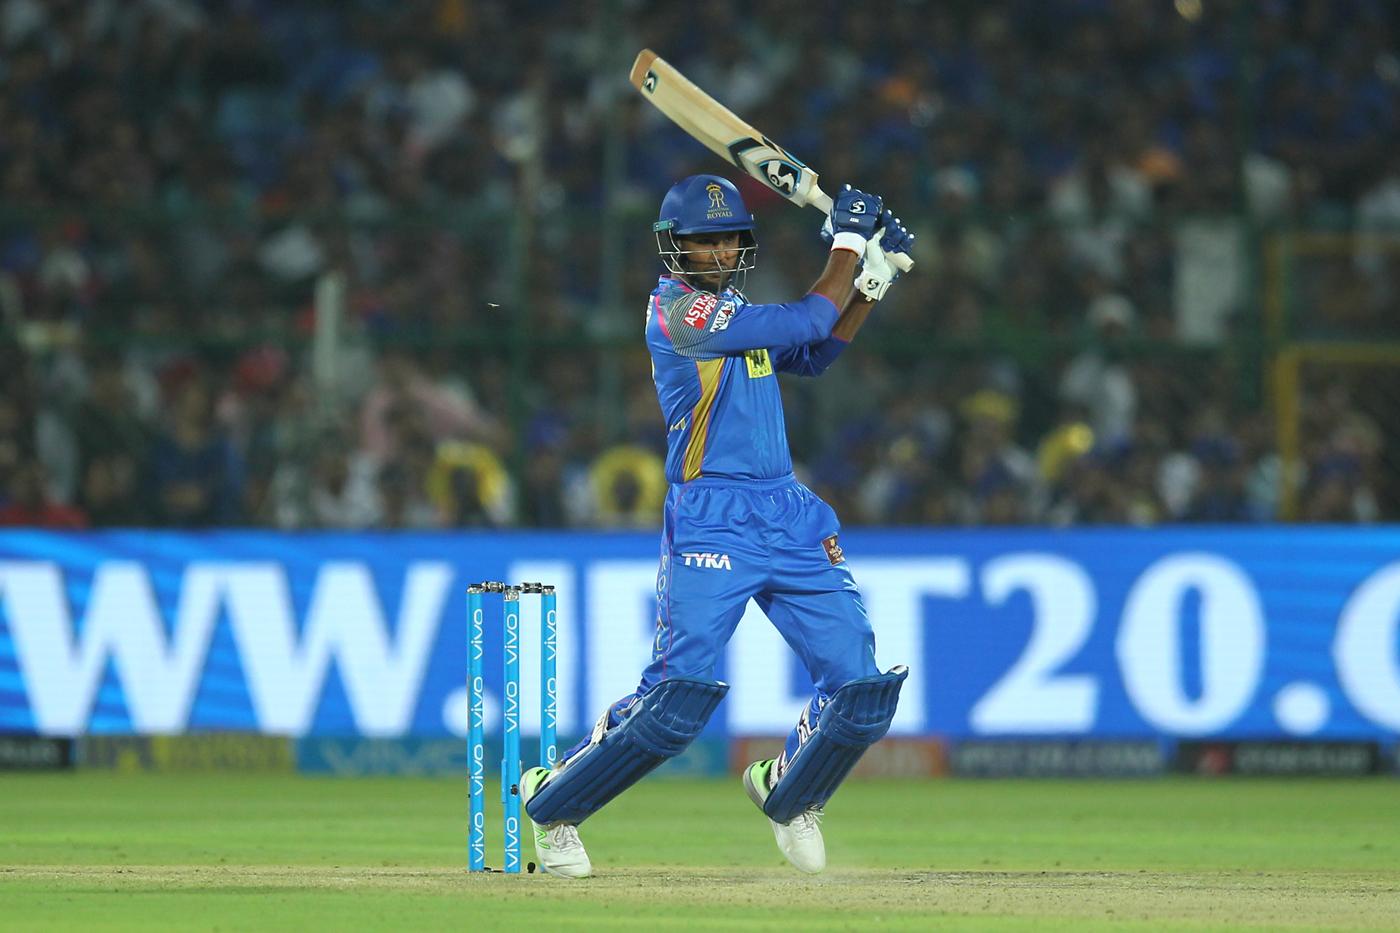 IPL 2018: Match 21, Rajasthan Royals vs Mumbai Indians – Statistical Highlights